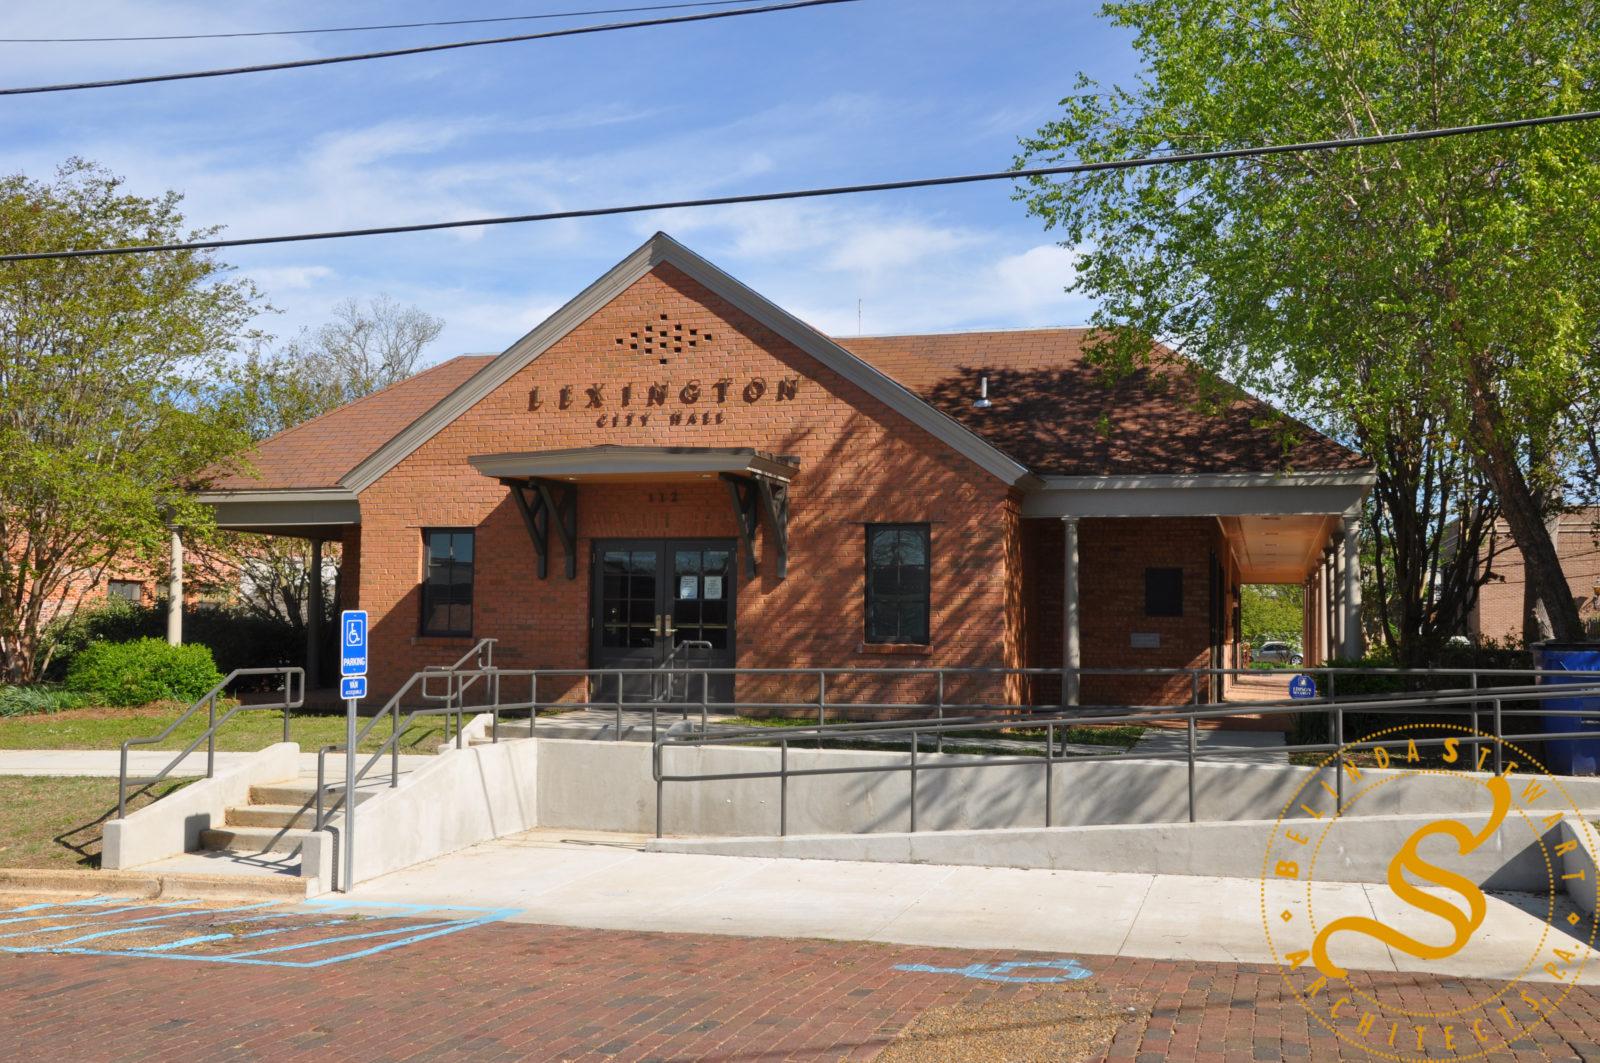 Lexington City Hall - Front Facade (After)